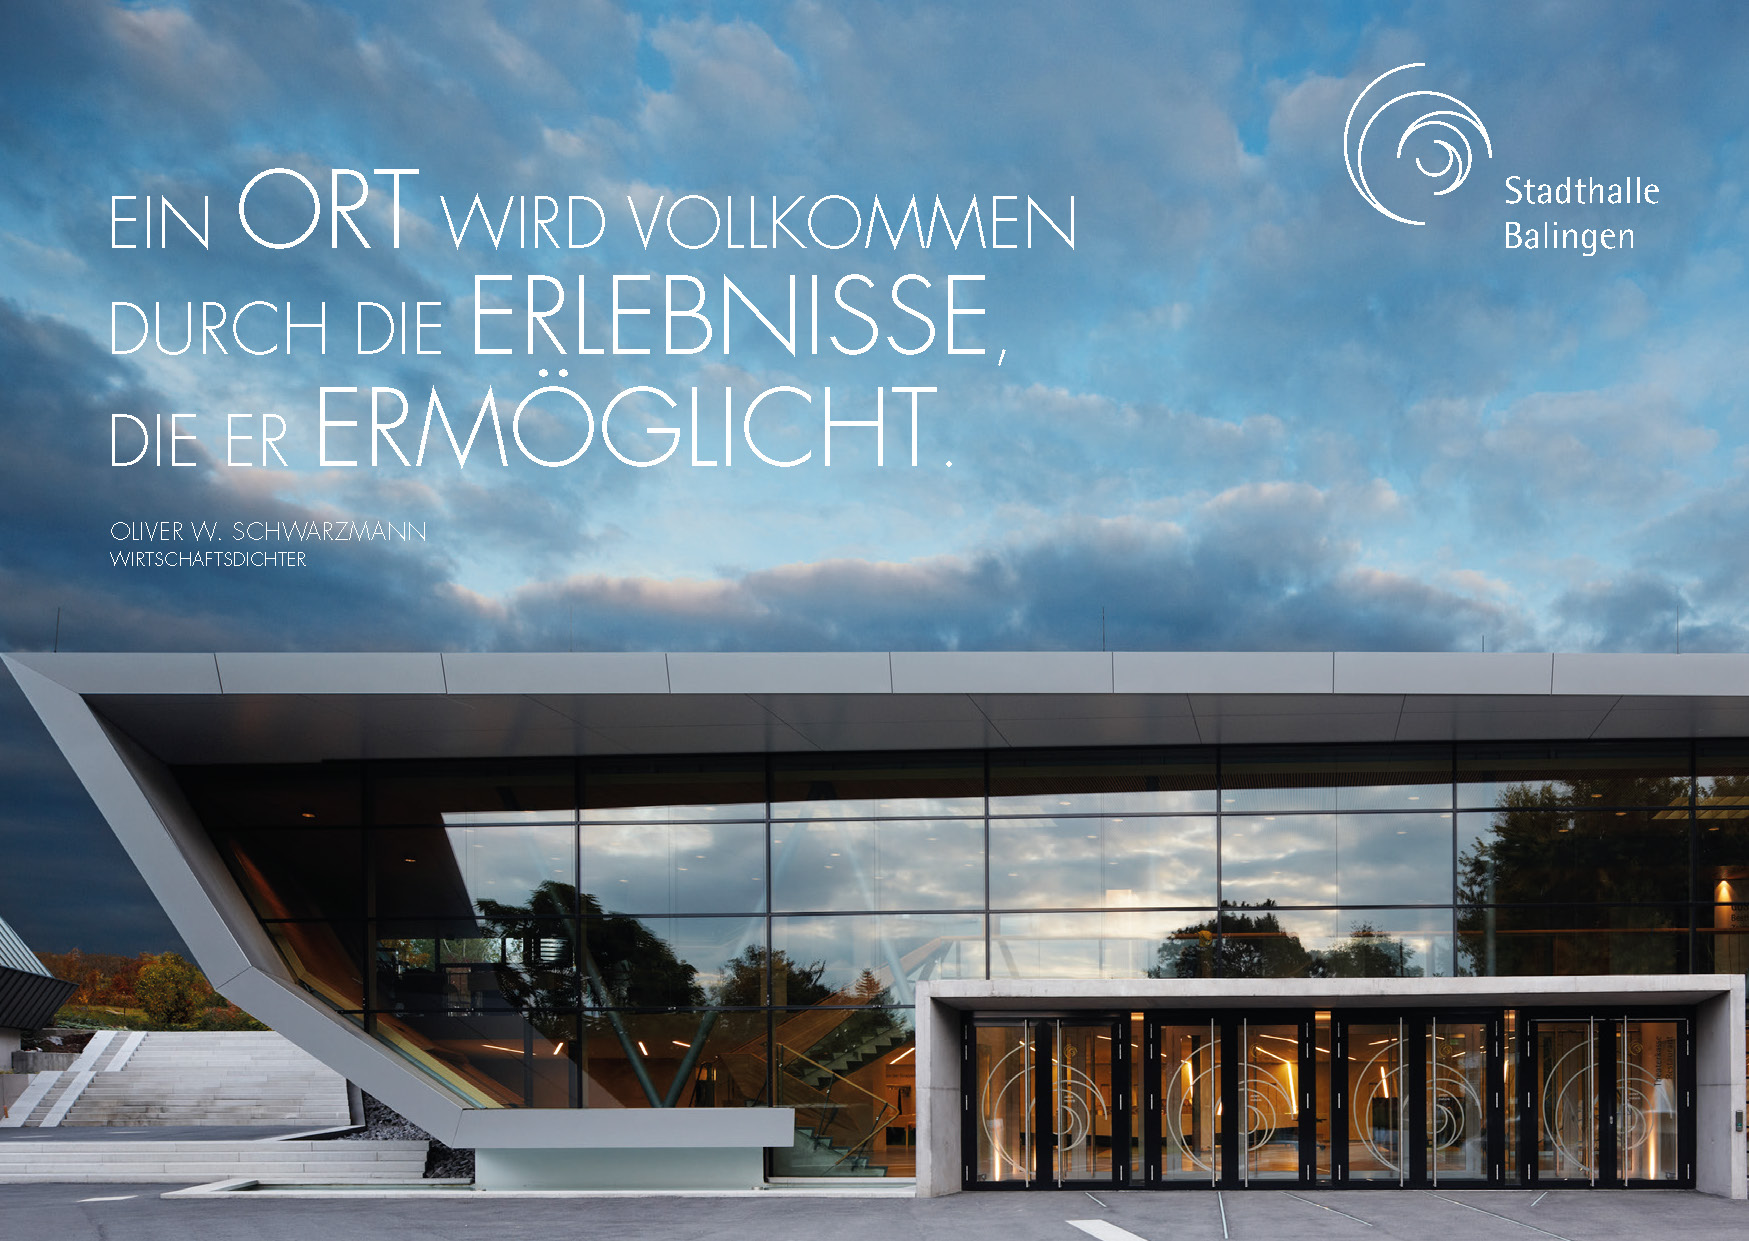 Dichter-Postkarte Stadthalle Balingen